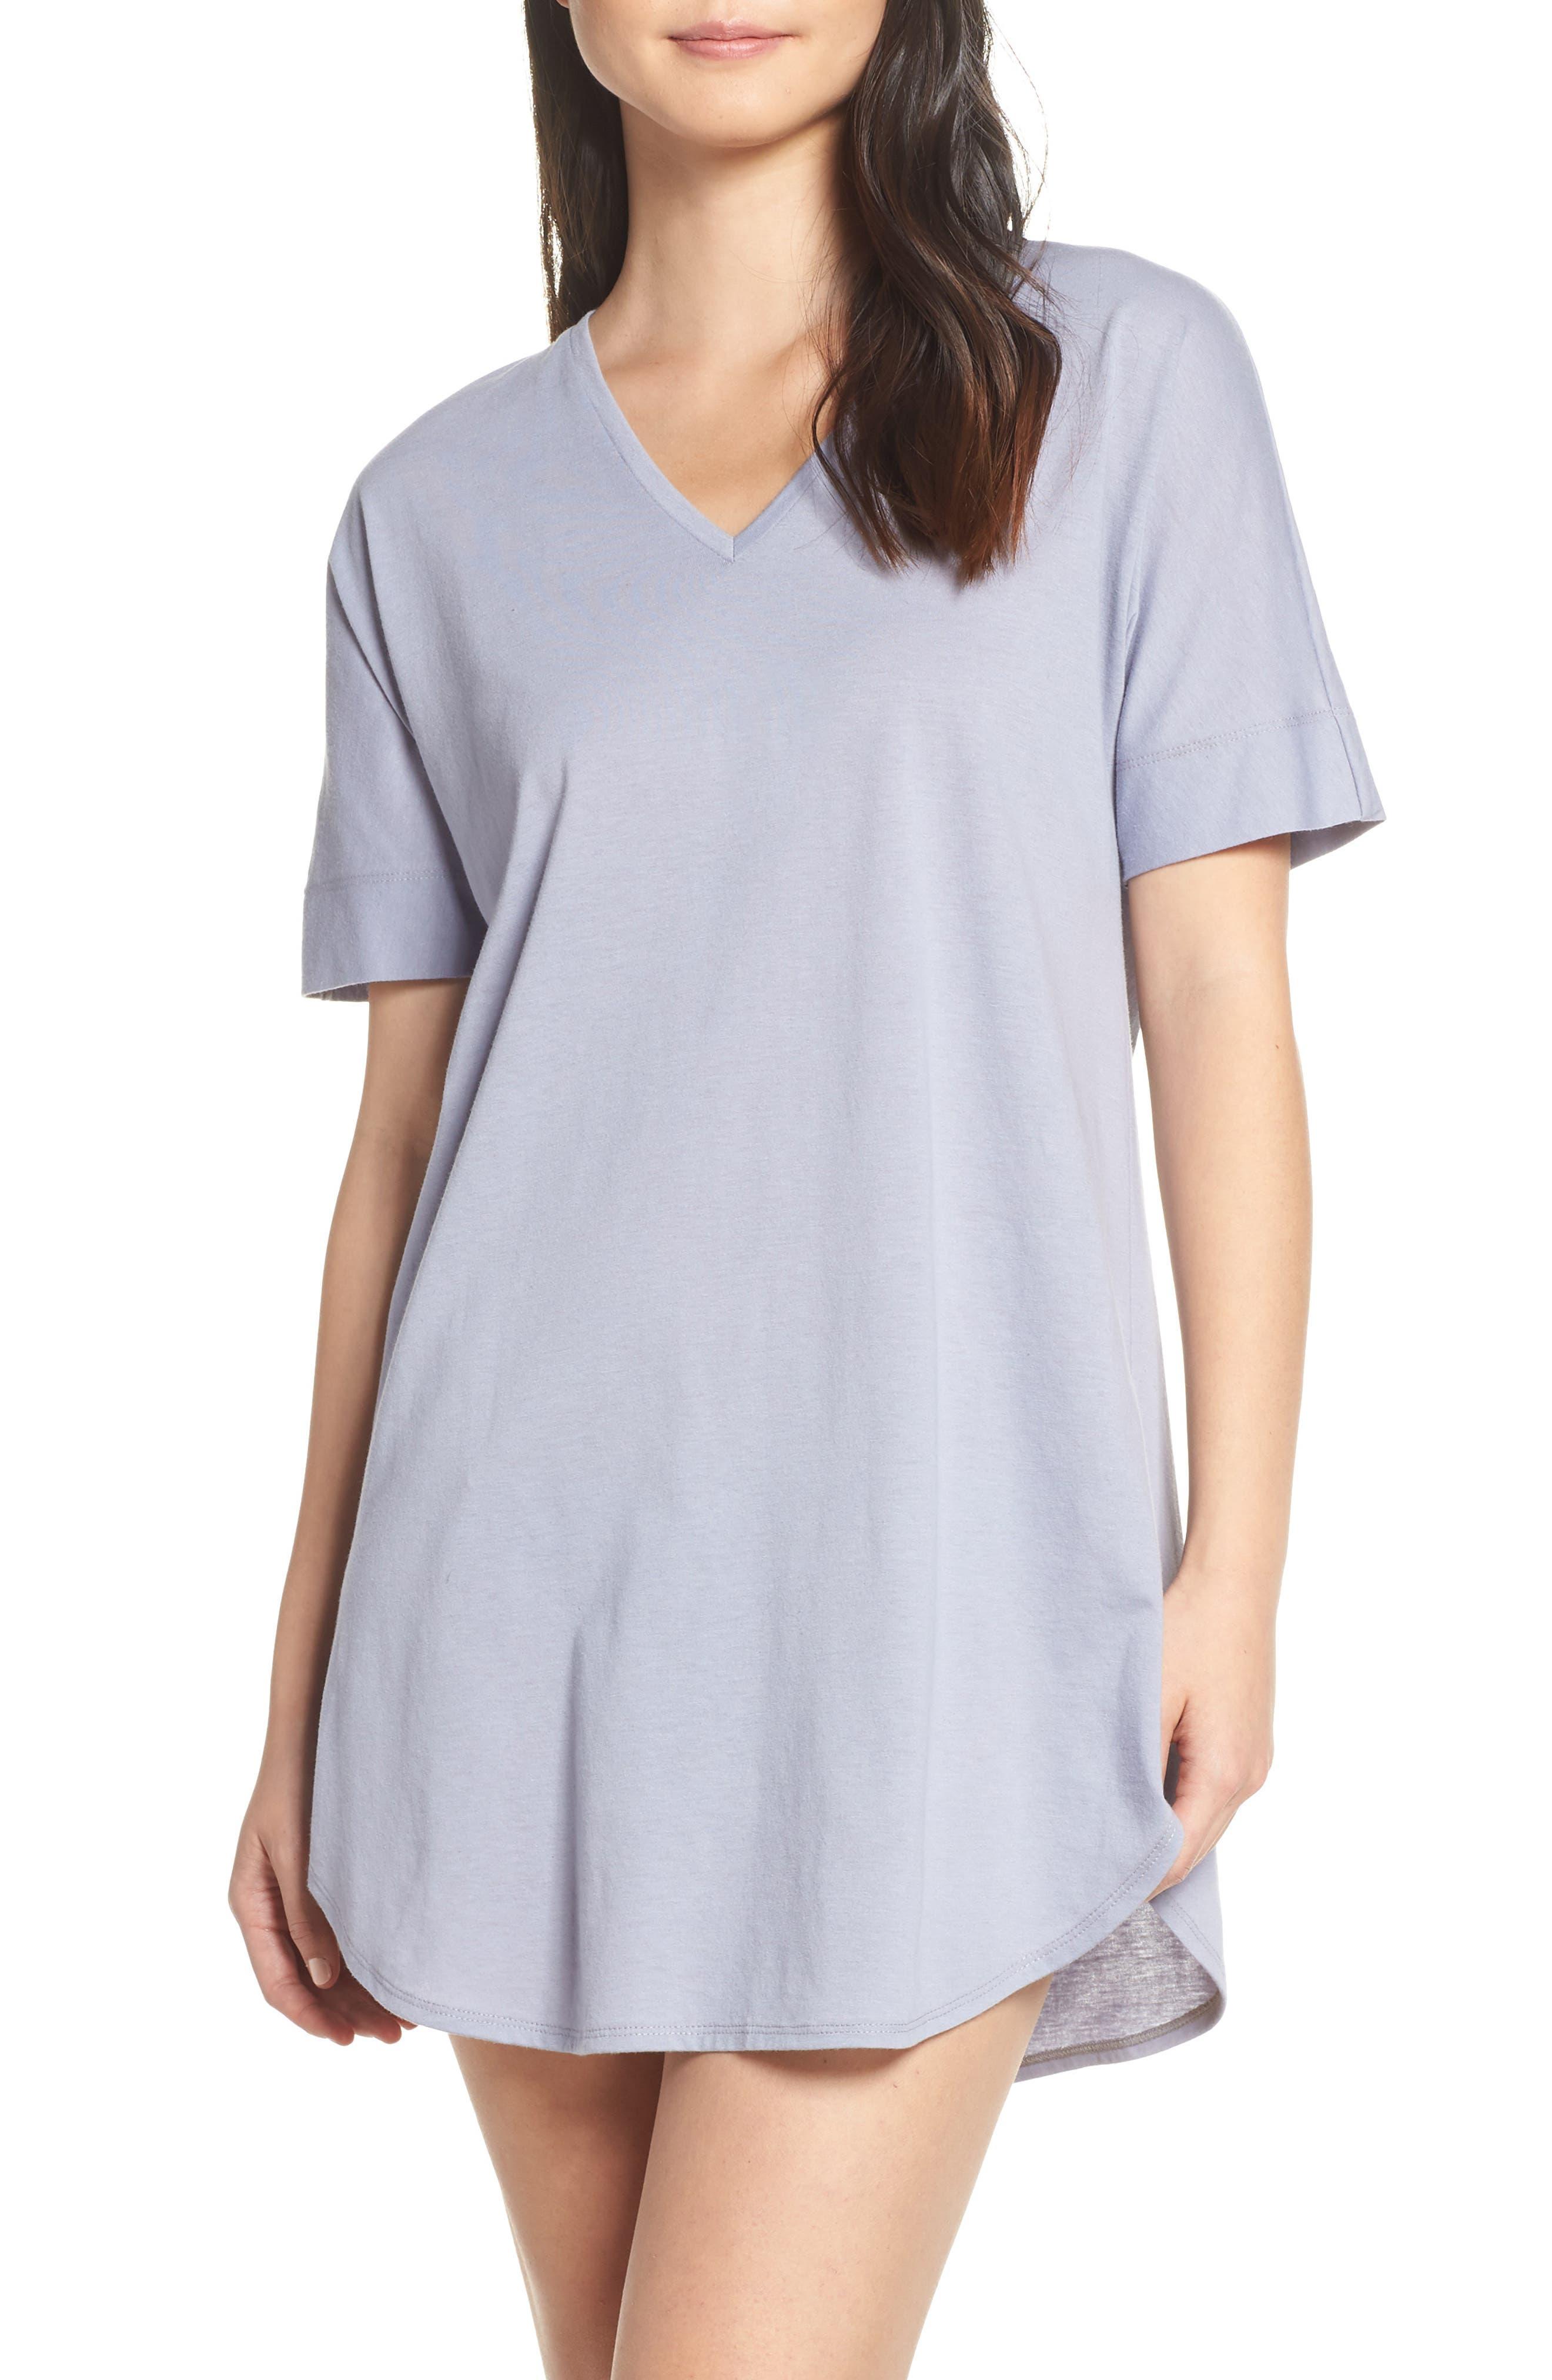 NATORI, V-Neck Sleep Shirt, Main thumbnail 1, color, SLATE BLUE